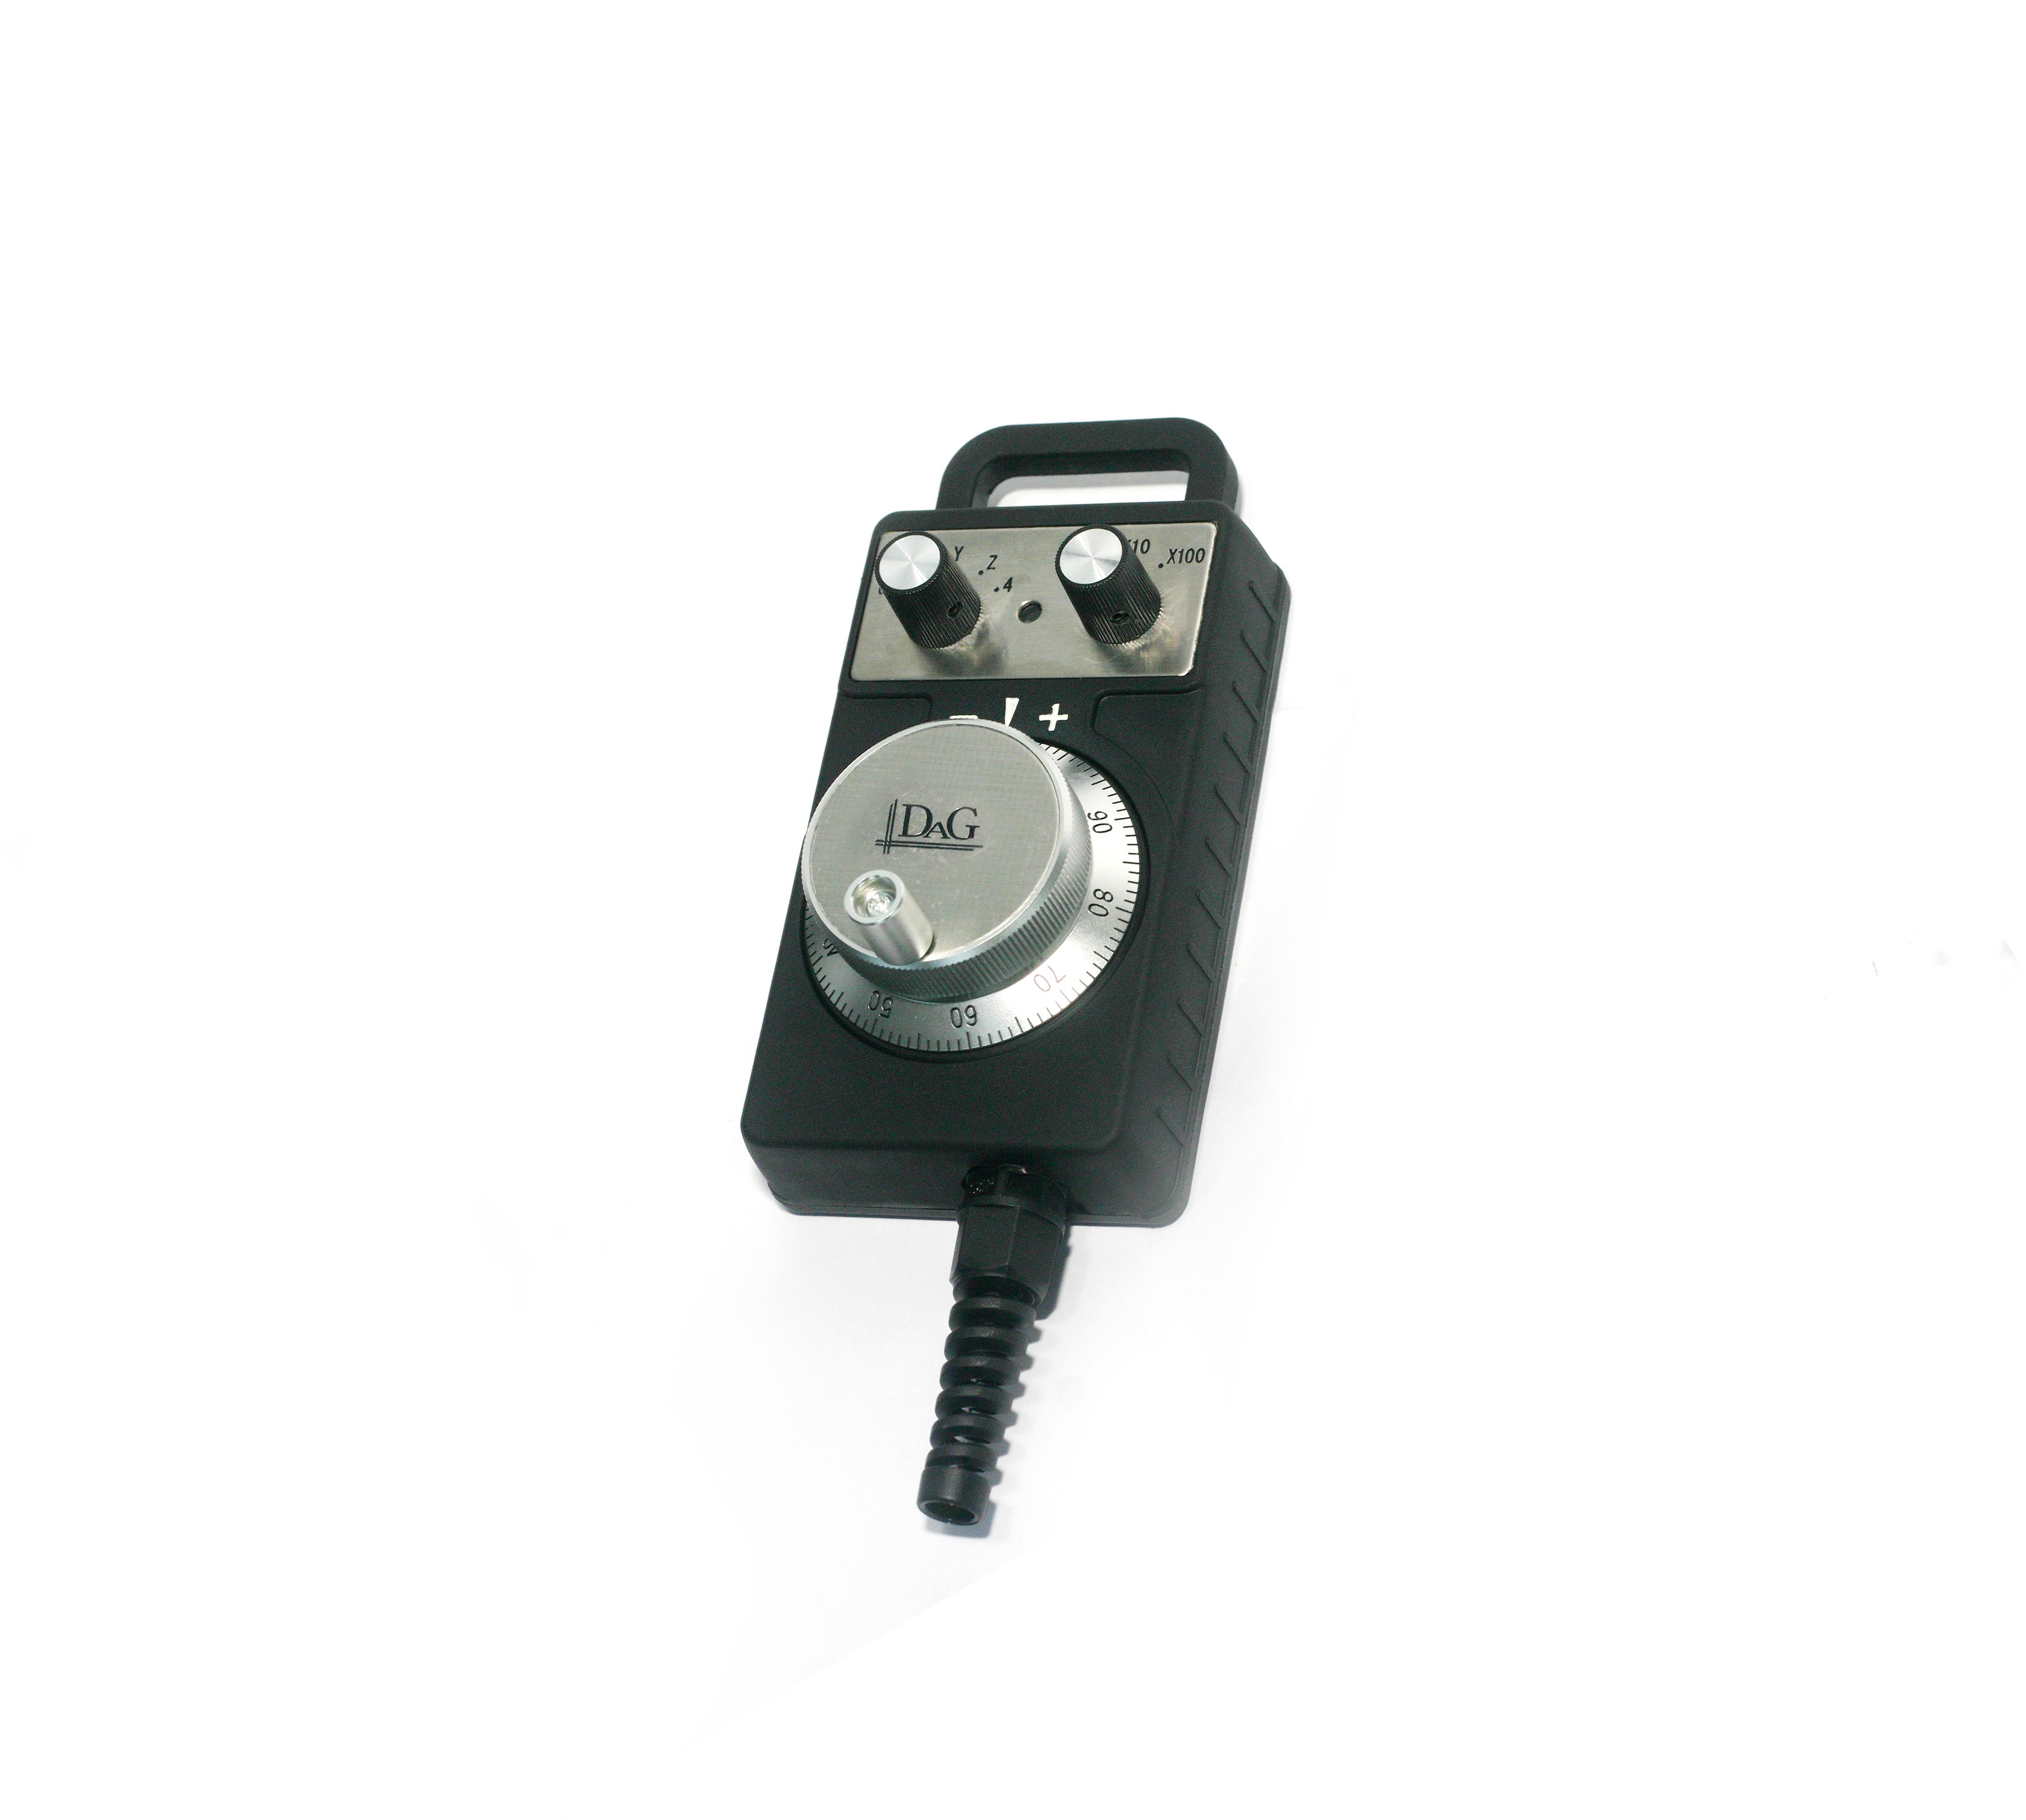 DAG数控机床加工中心精雕机通用型电子手轮脉冲发生器HC115电子手轮